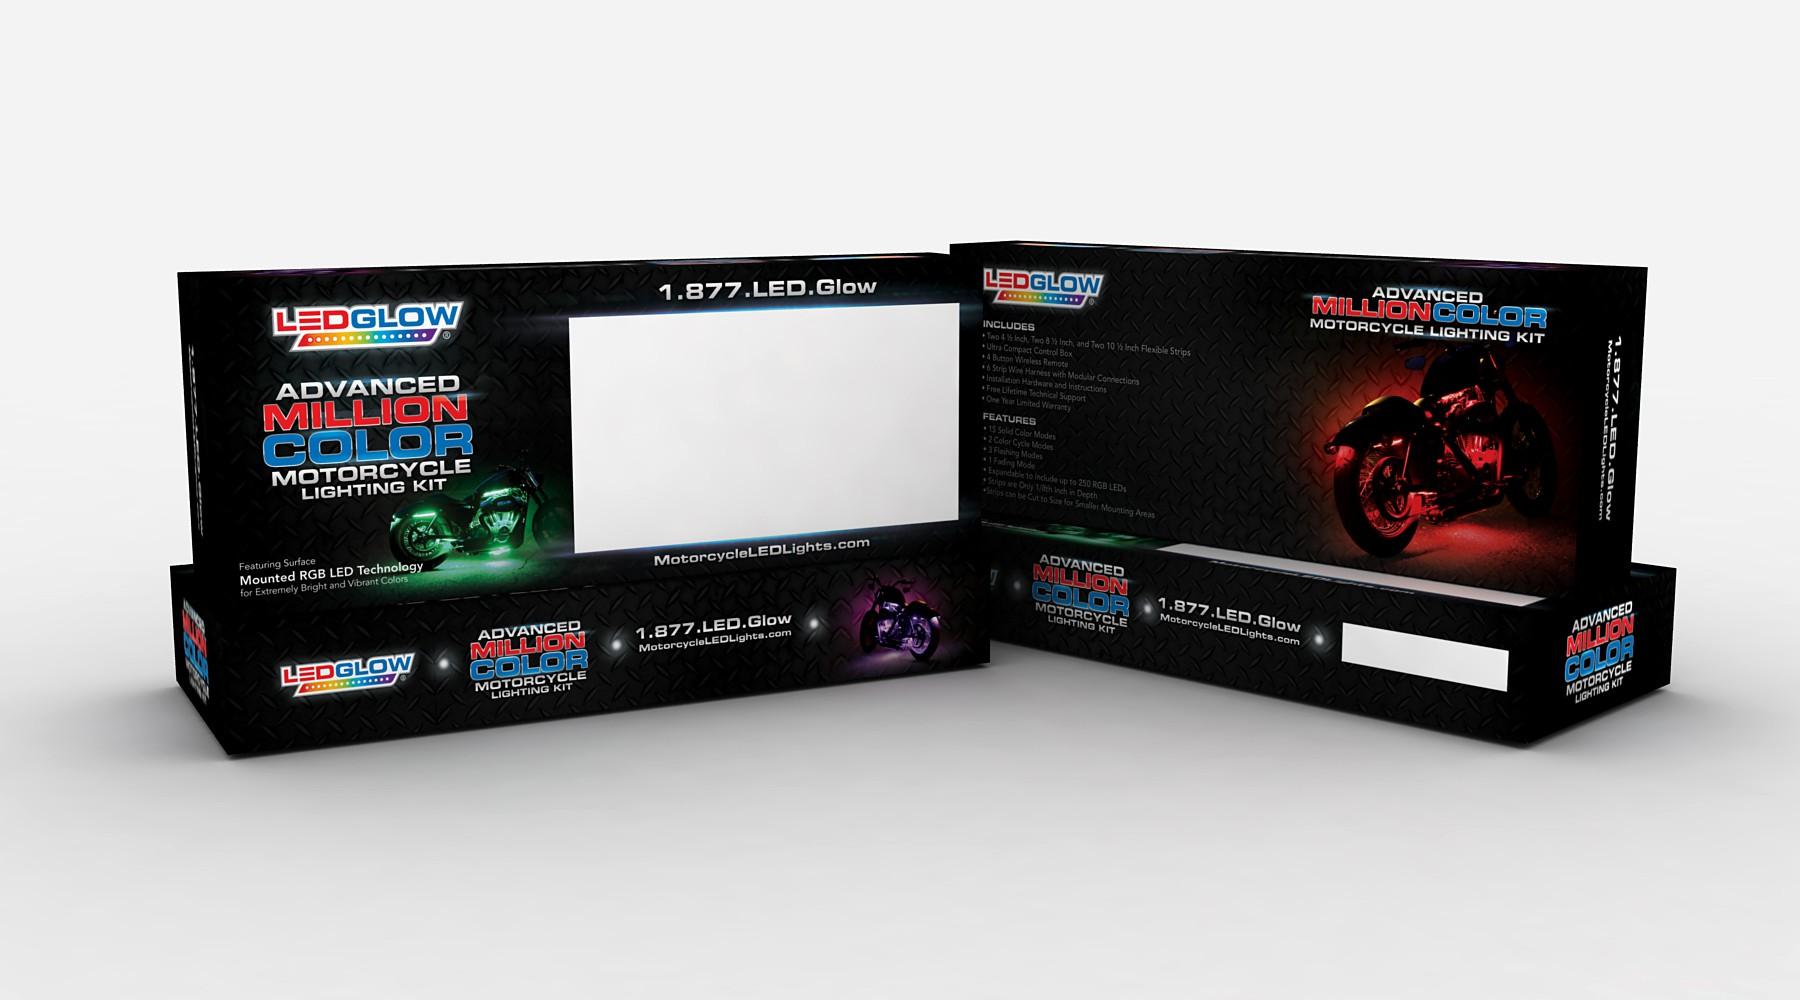 Design LEDGlow's MIllion Color Motorcycle Lighting Kit Packaging